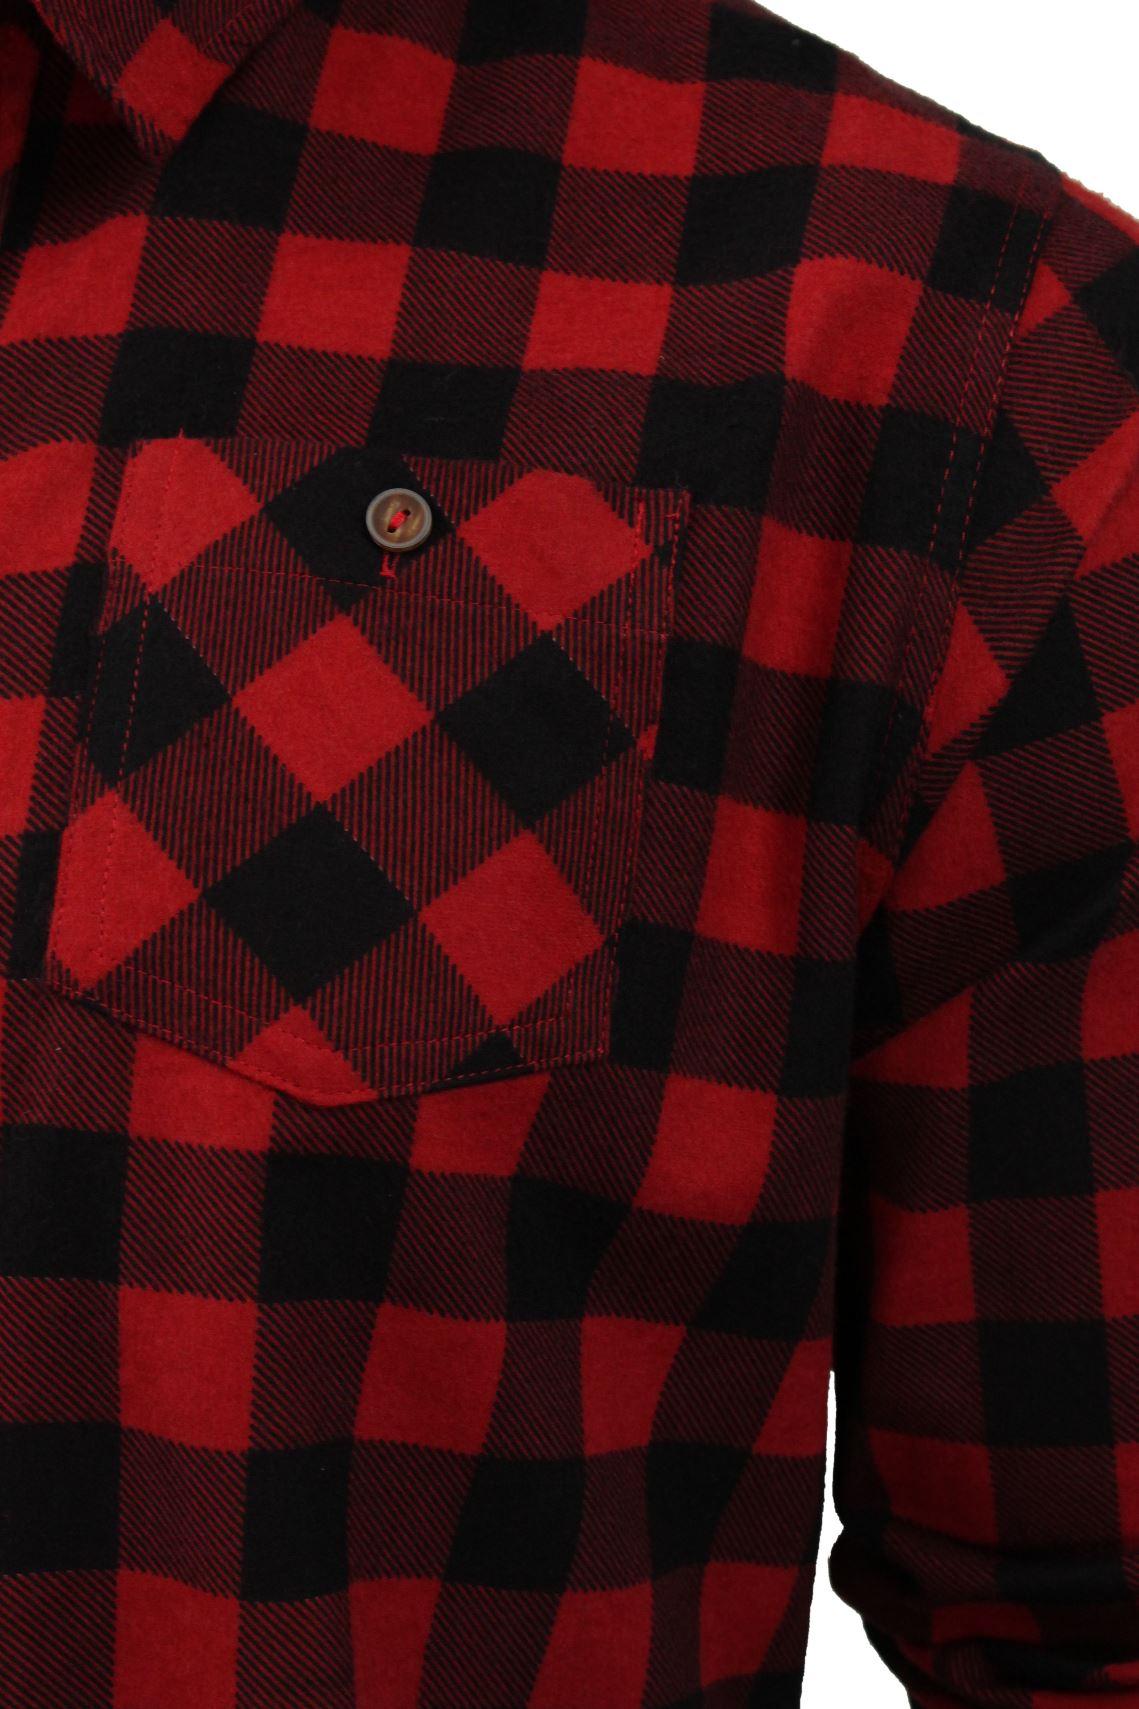 Brave-Soul-Brushed-Flannel-Check-Cotton-Jack-Shirt-Long-Sleeved thumbnail 8